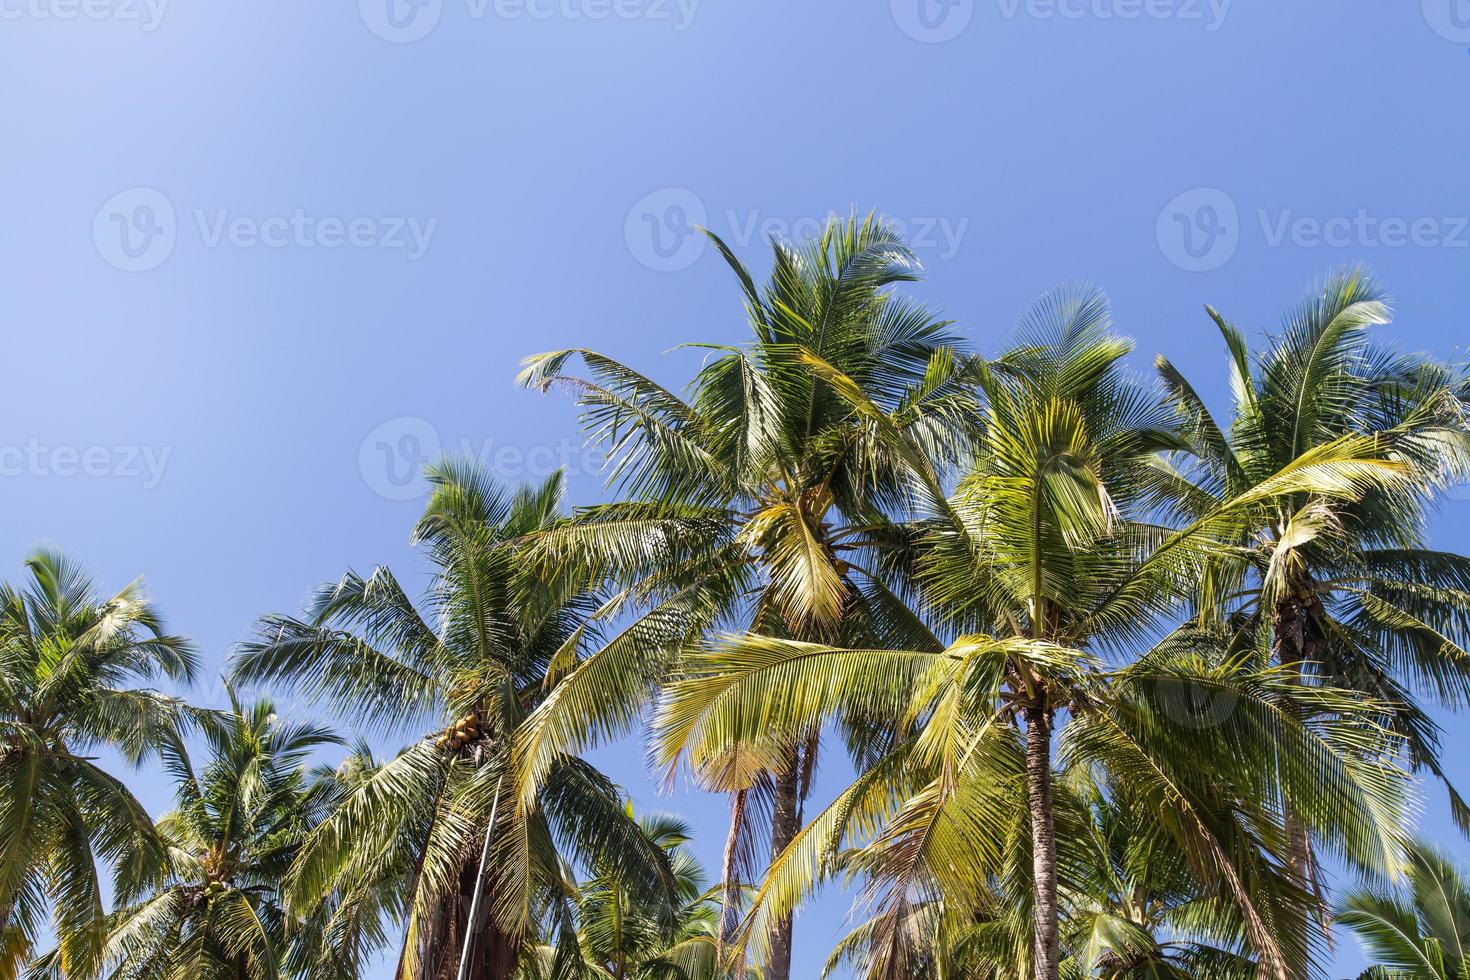 palmbomen met kokos onder blauwe hemel foto